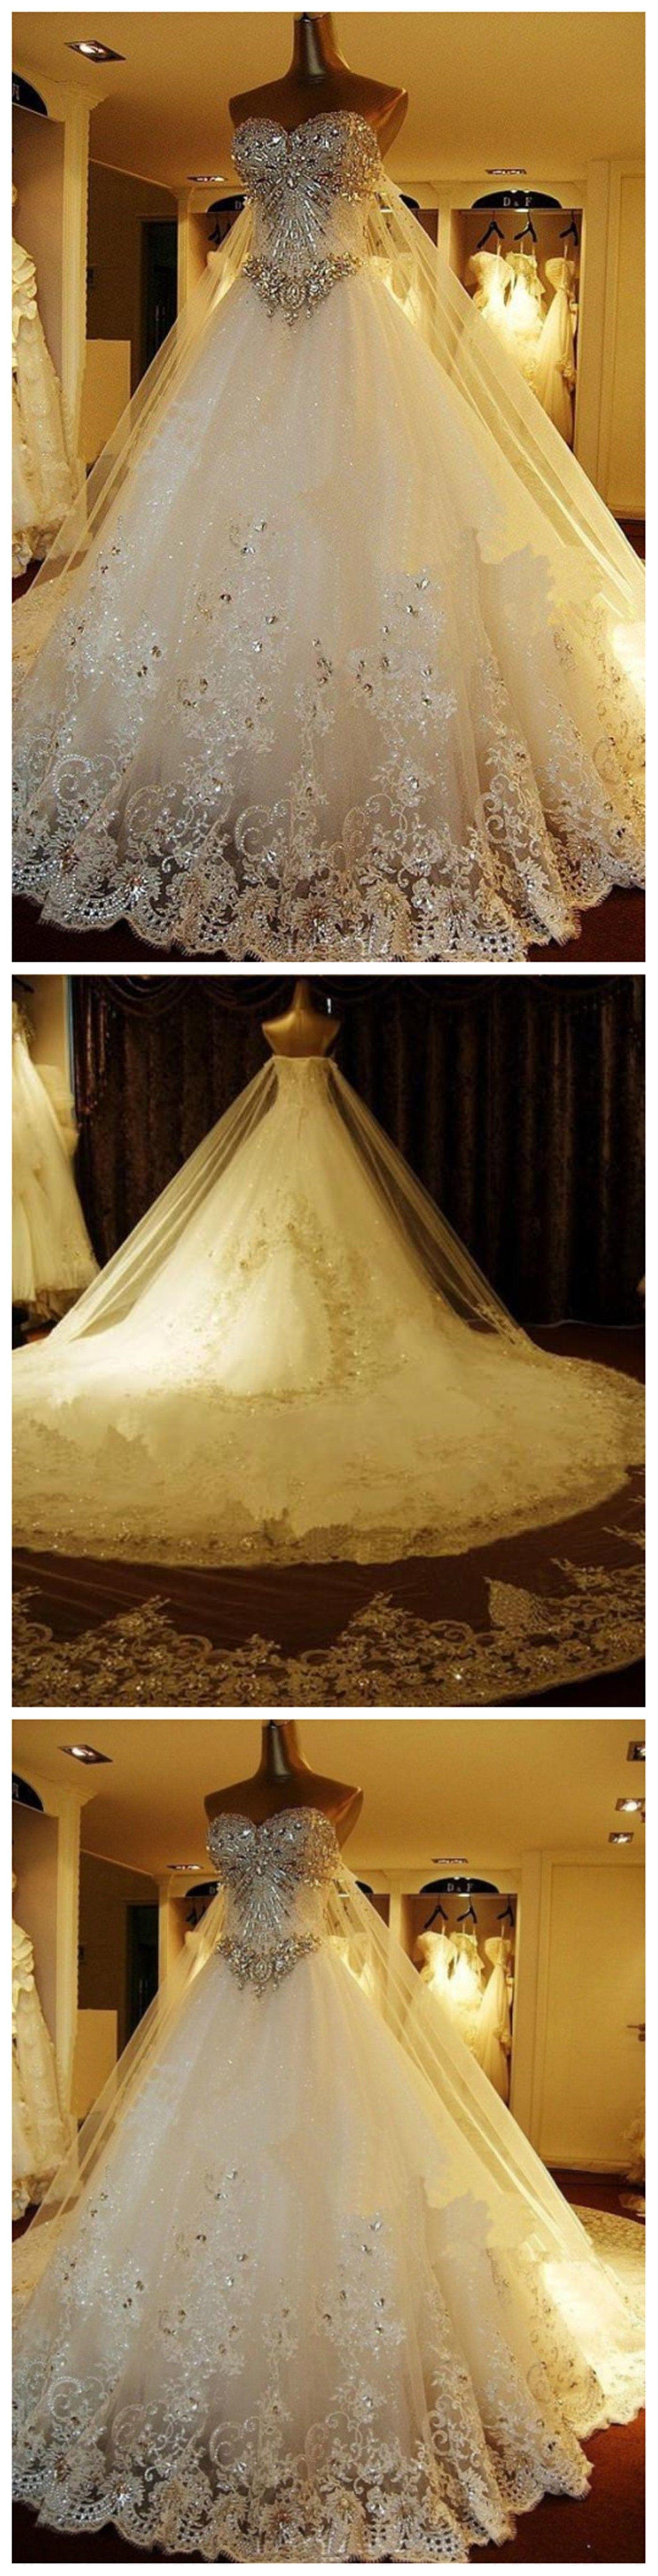 Rhinestone wedding dresses  Sparkly Rhinestone Lace A line Wedding Dresses  Luxurious Long